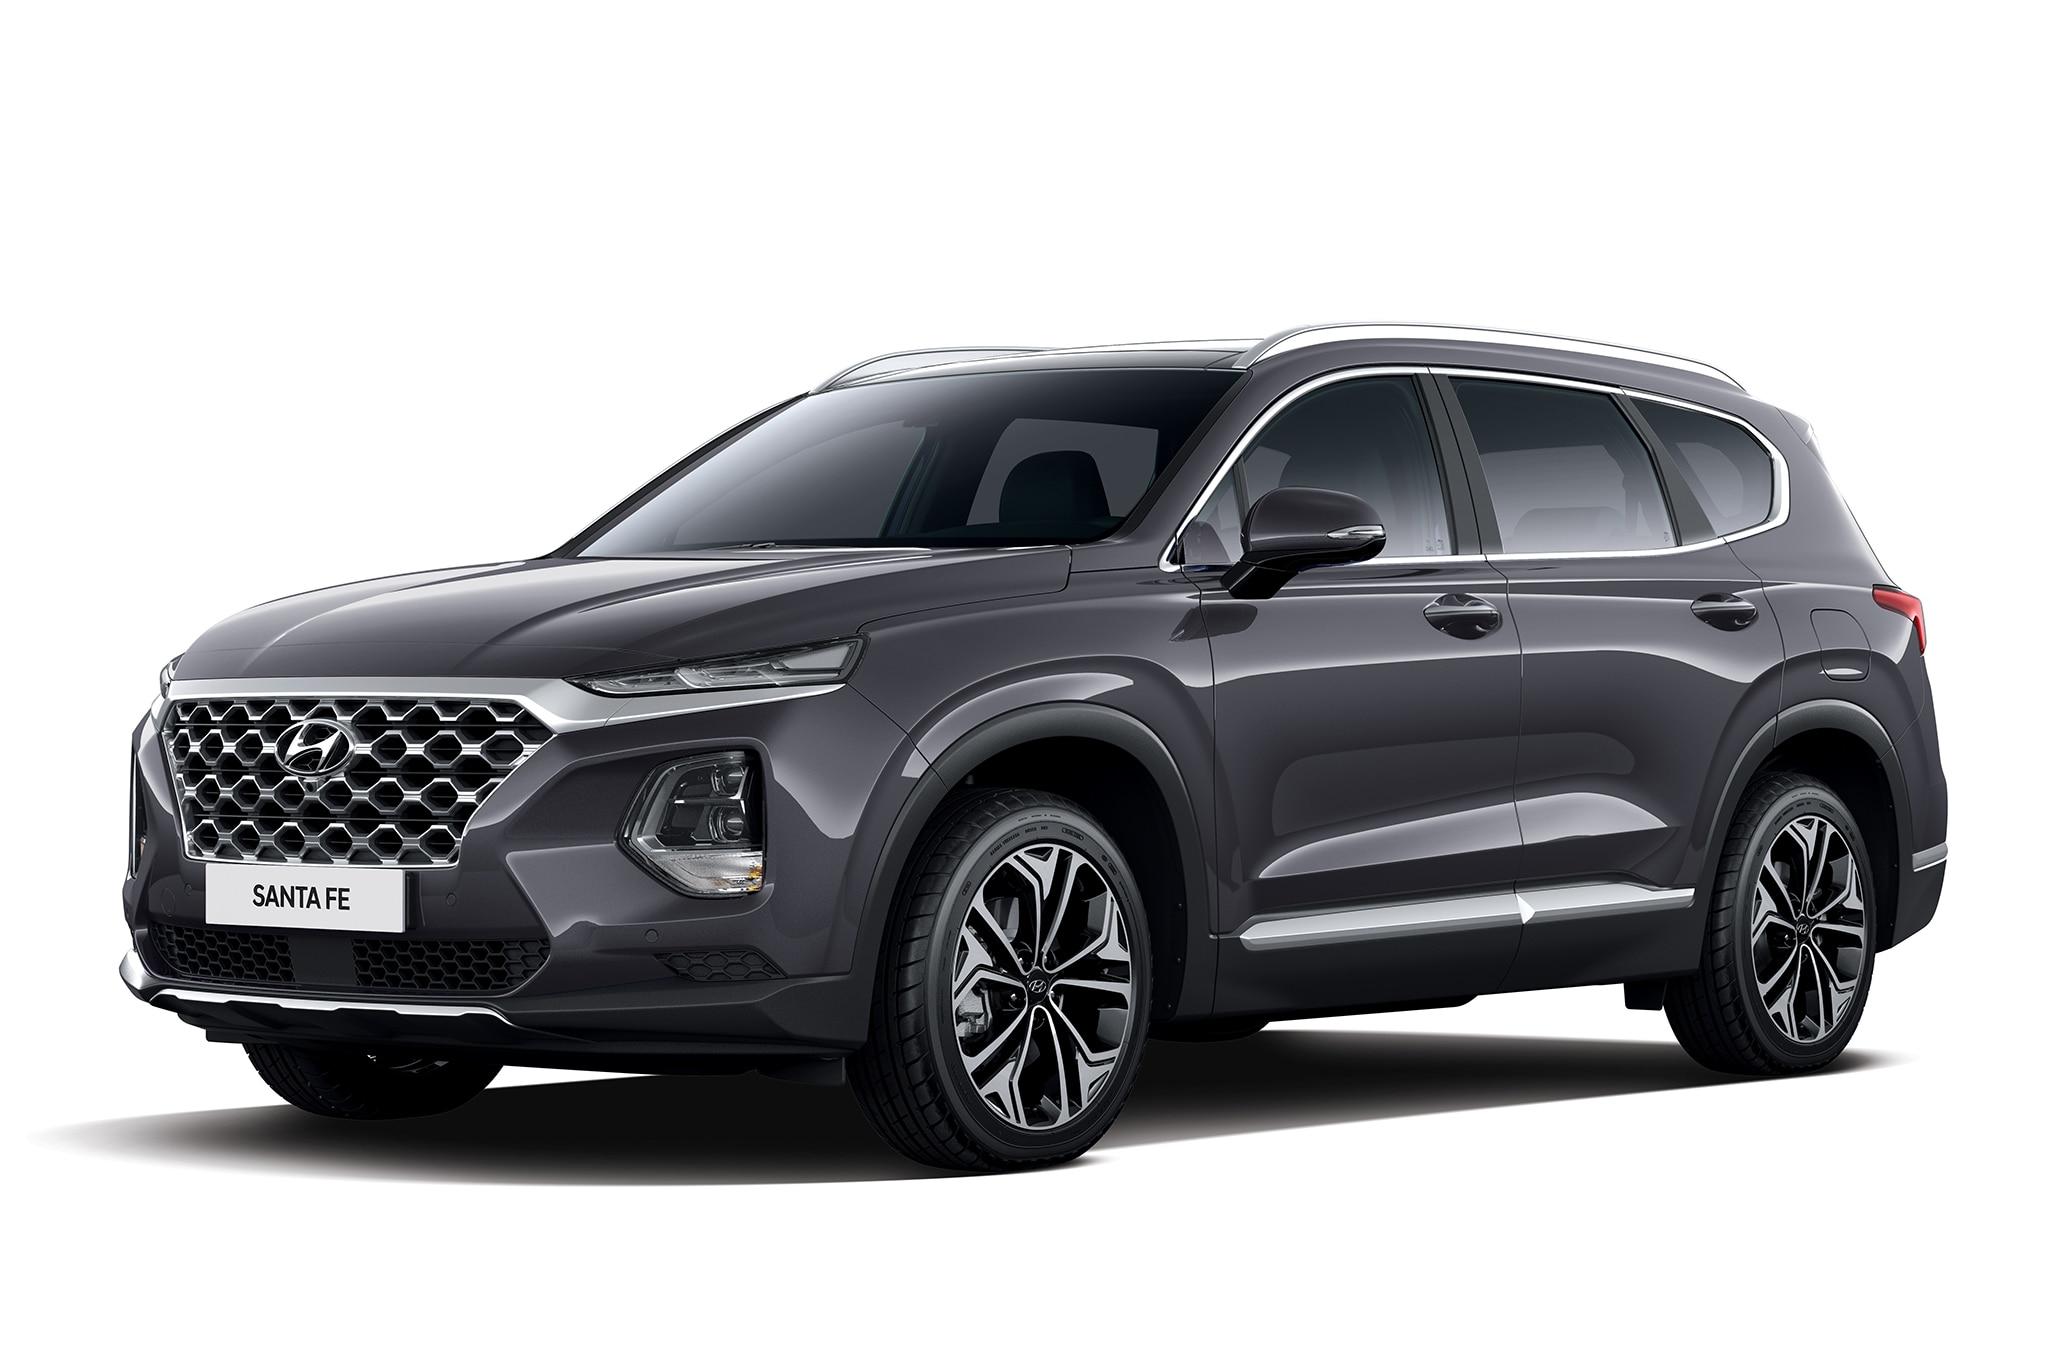 2019 Hyundai Santa Fe Korean Market Front Three Quarter 4